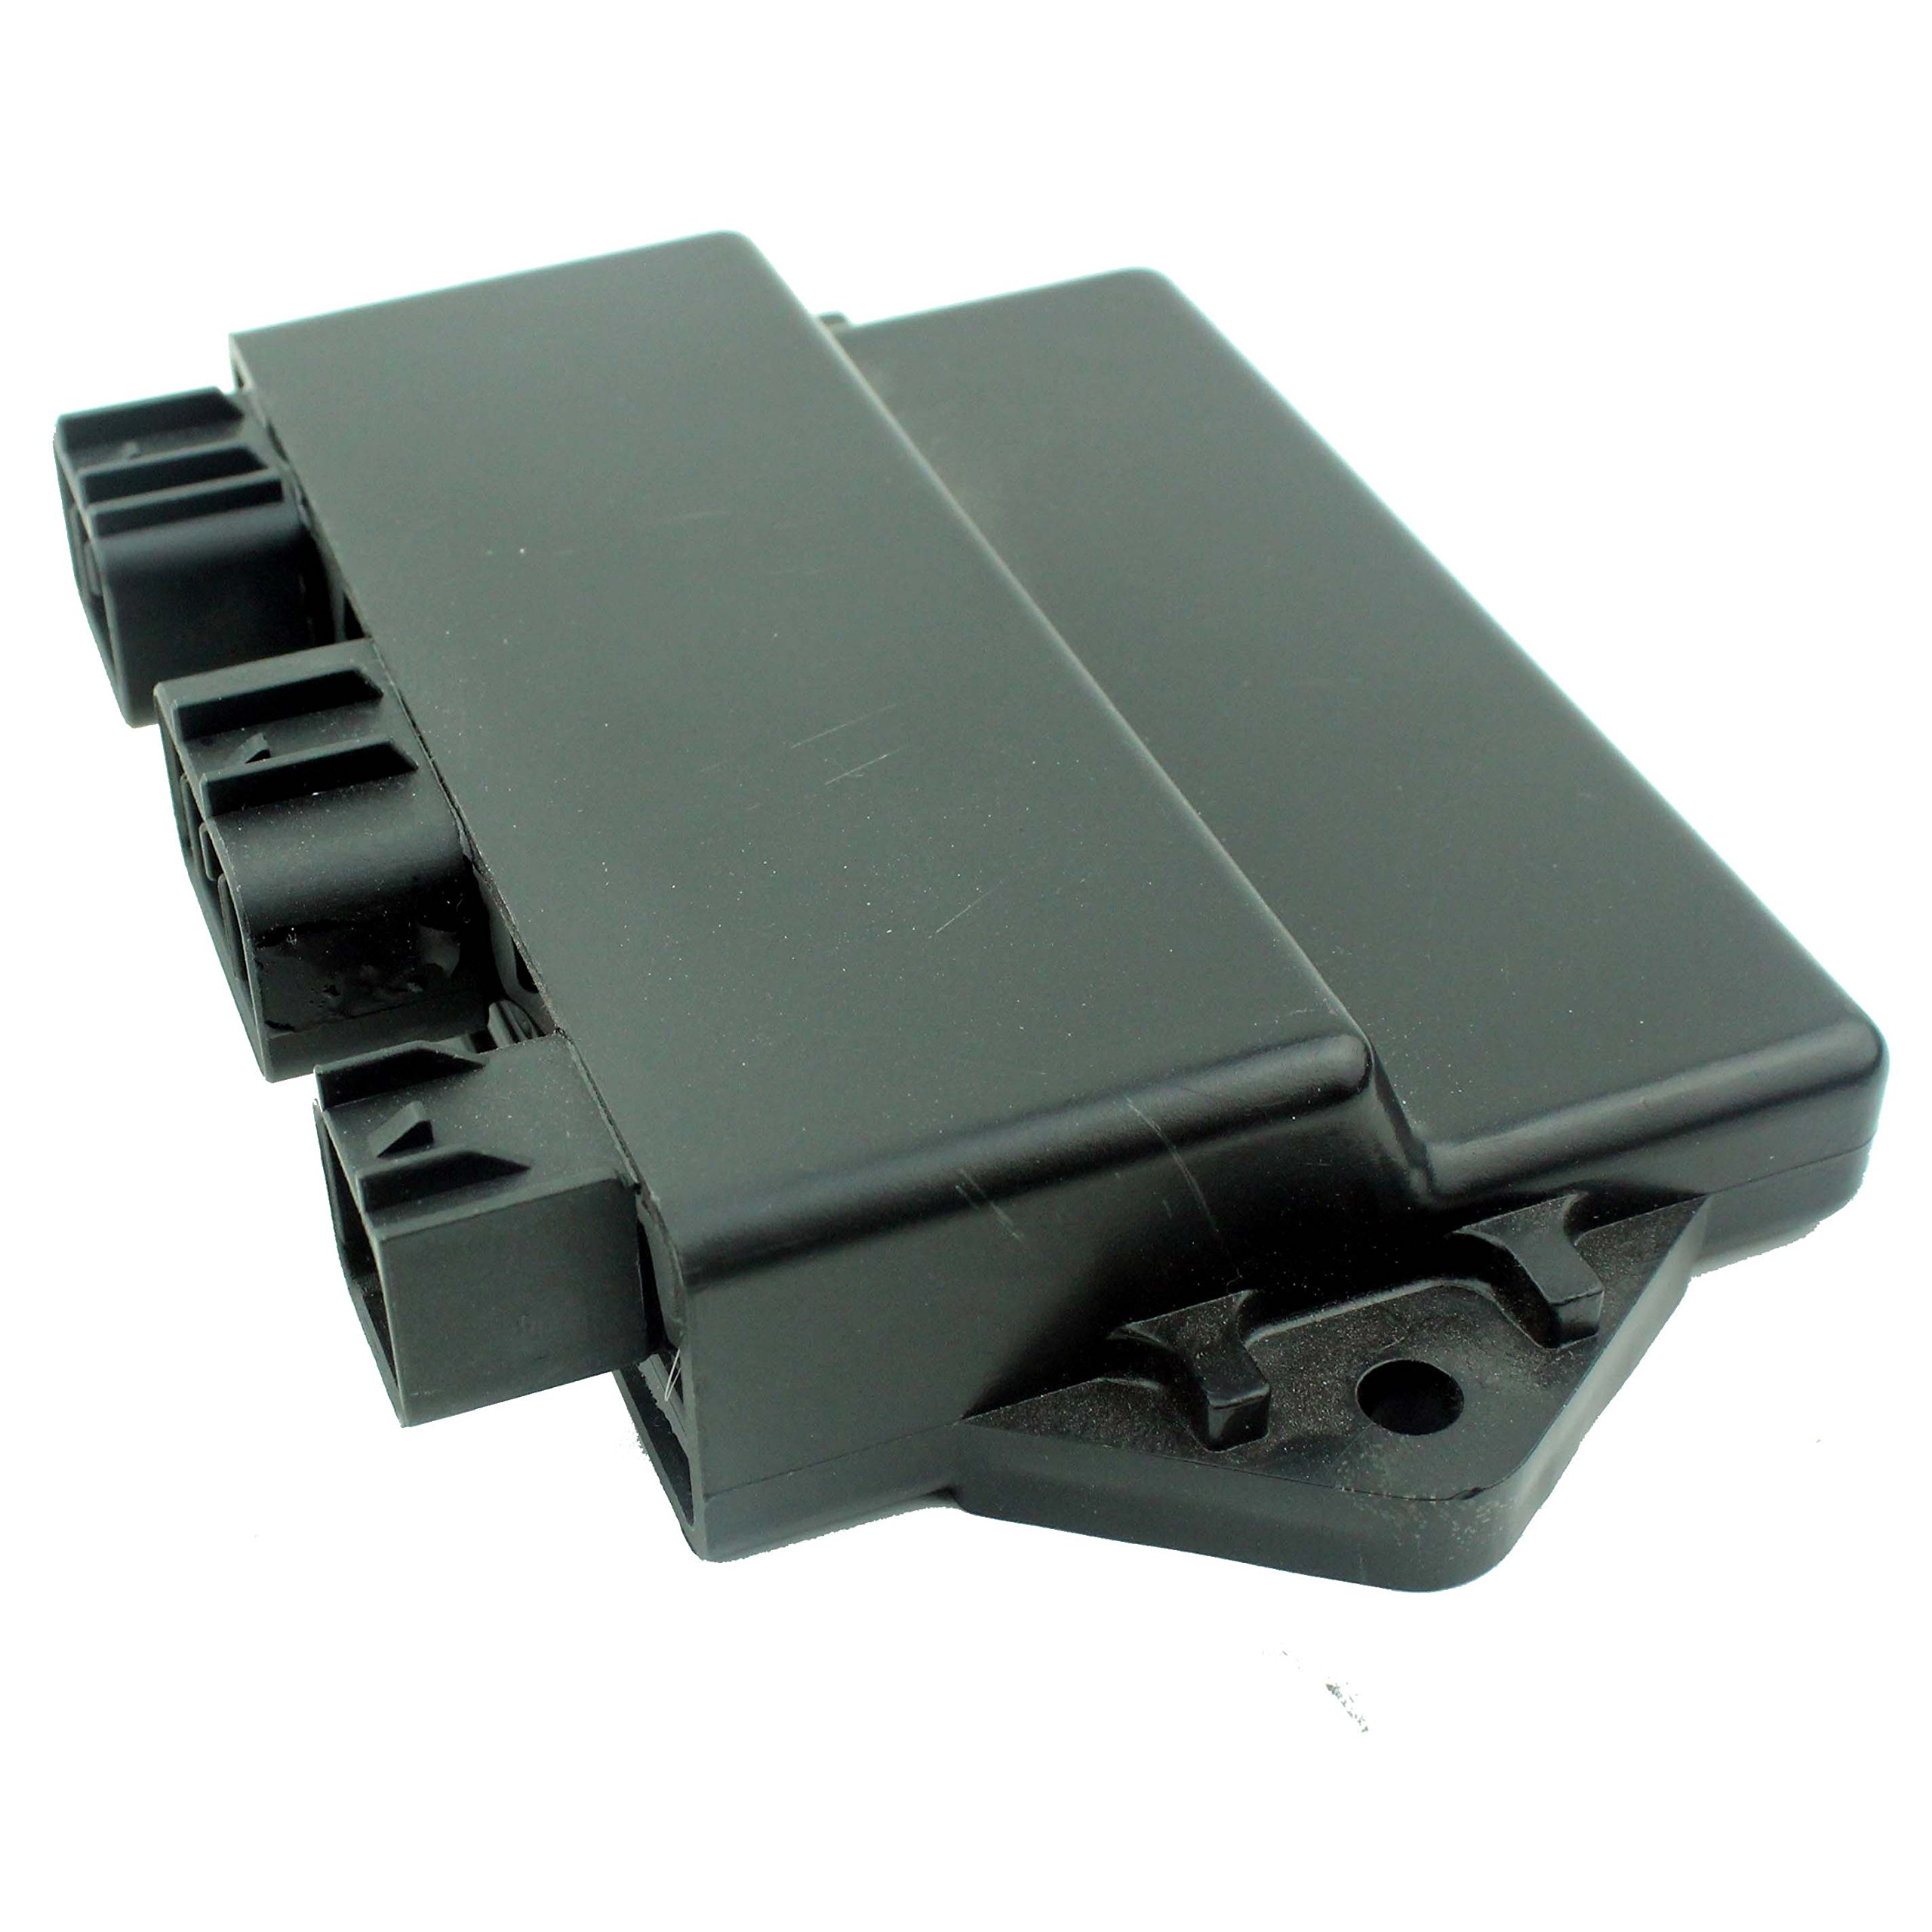 High Performance CDI Box For Yamaha YFM 450 Grizzly/Kodiak 2004-2007 YFM450 OEM Repl.# 5ND-85540-10-00